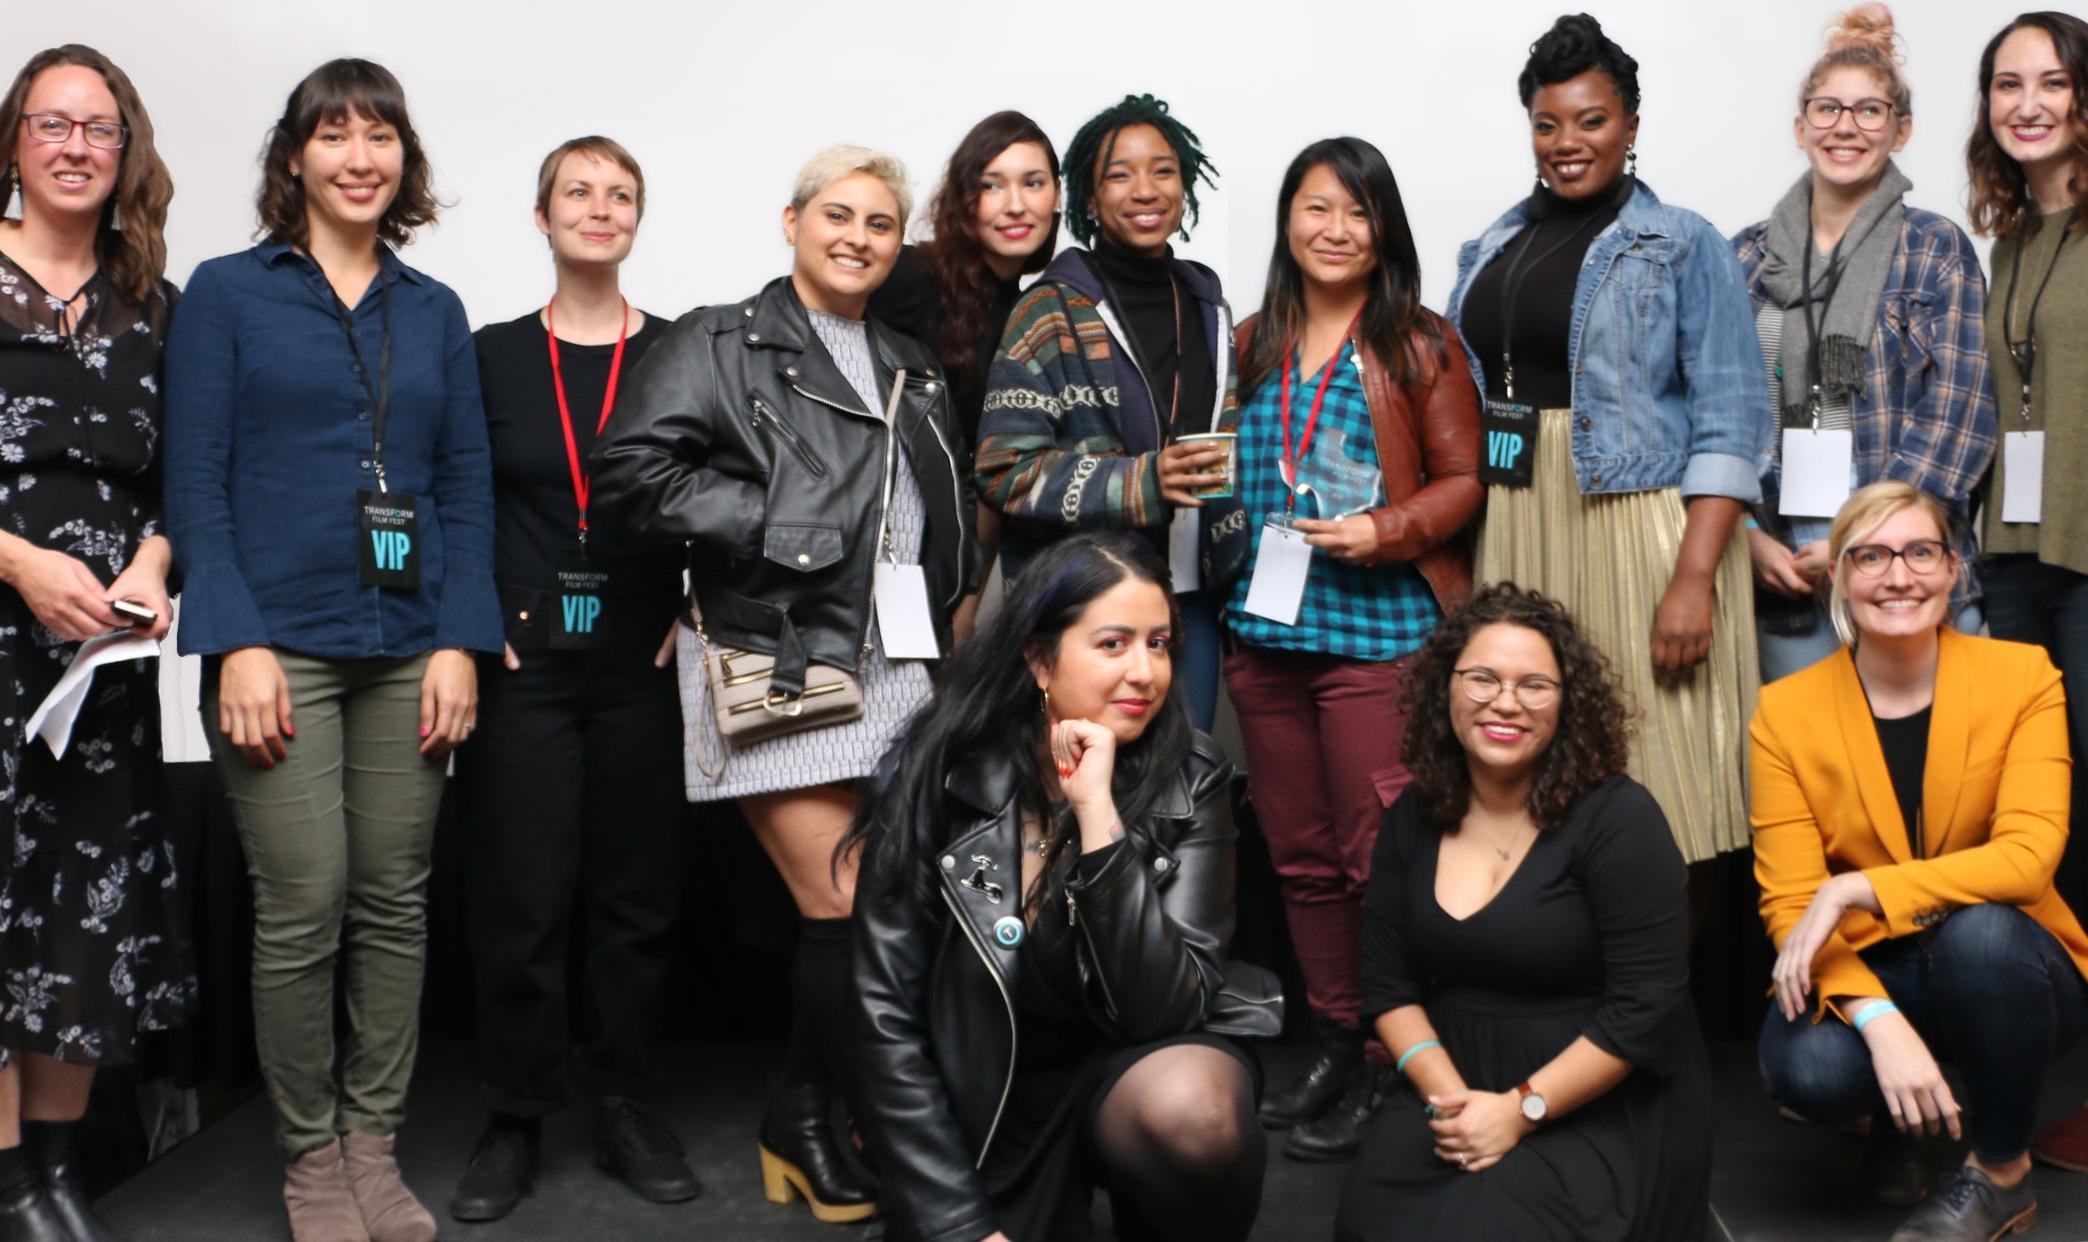 Photo courtesy of Transform Film Fest